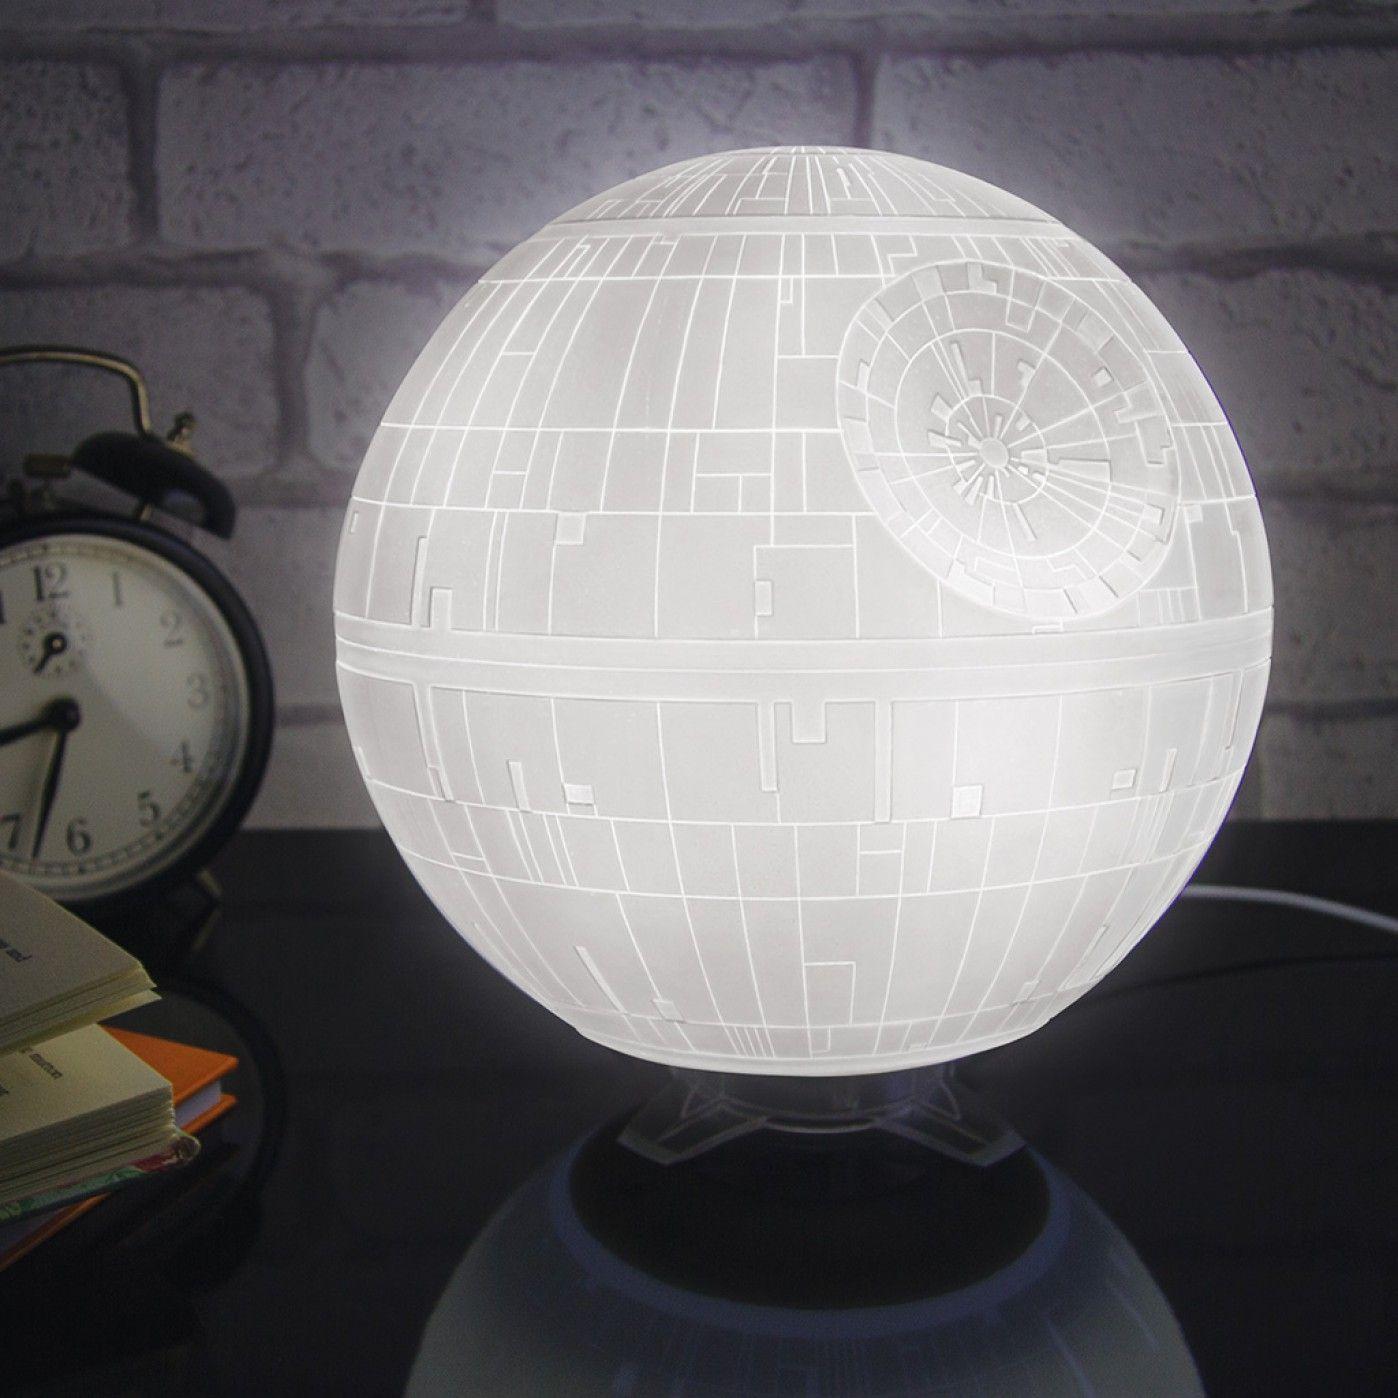 lampe etoile noire star wars | déco | pinterest | star wars, etoile